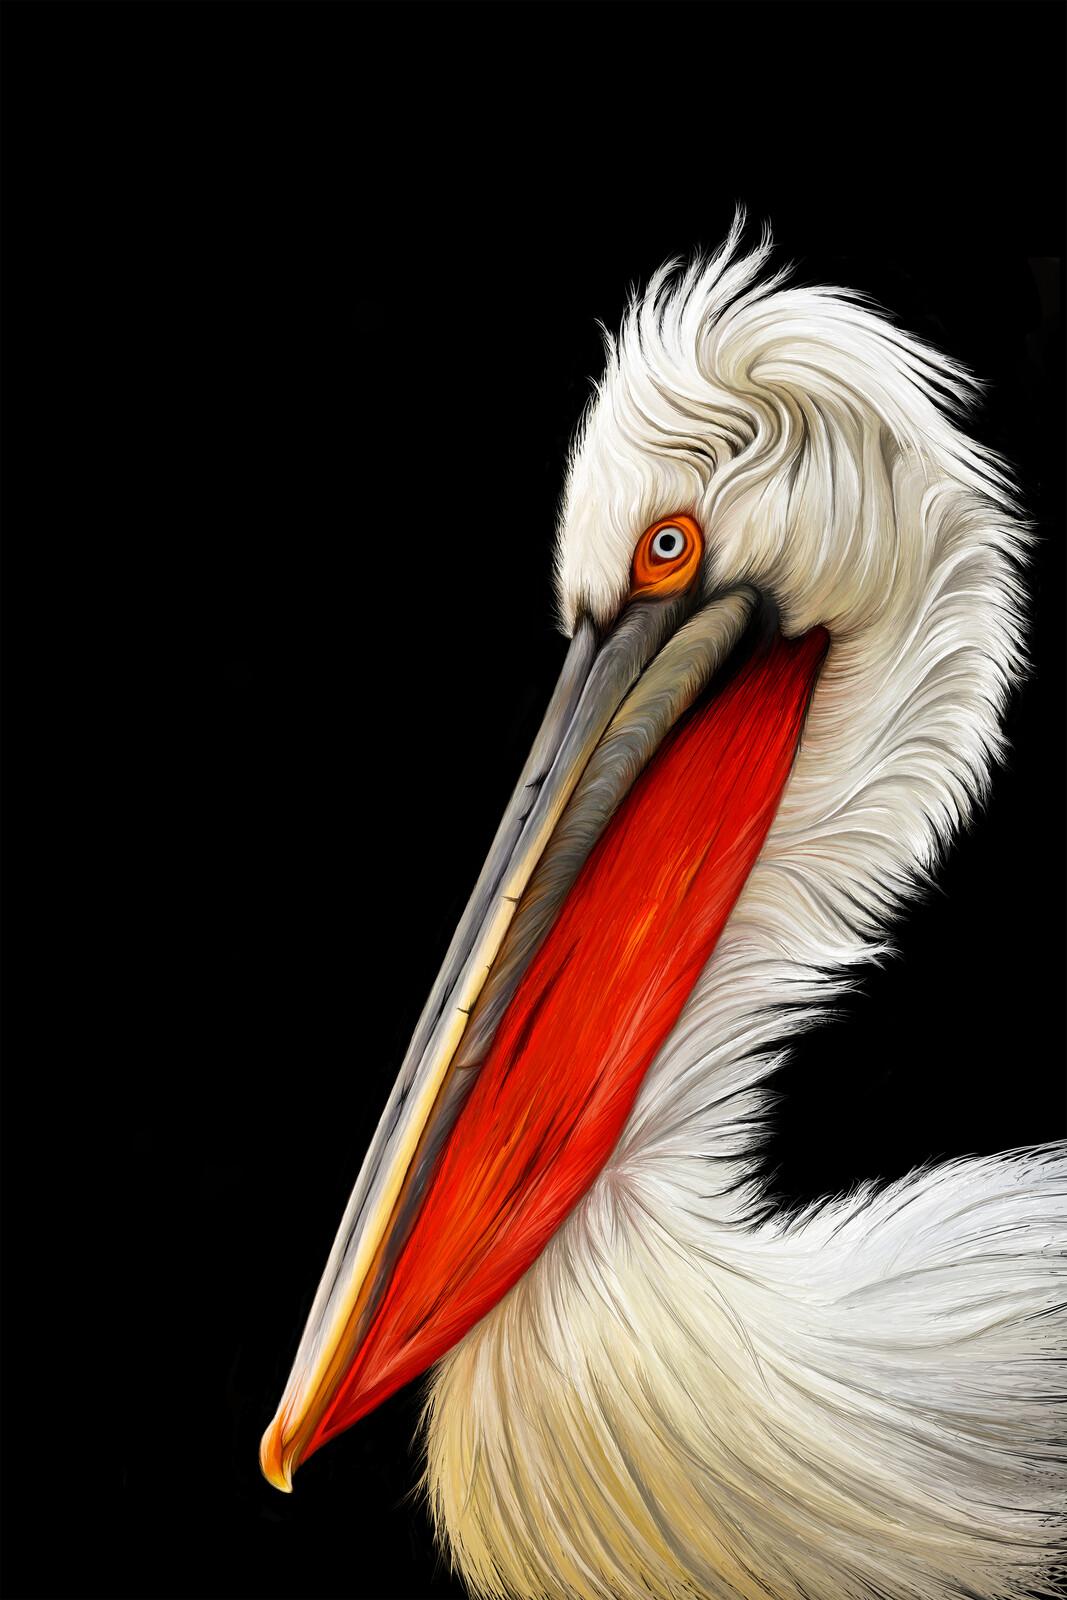 The Dalmatian Pelican - Painting